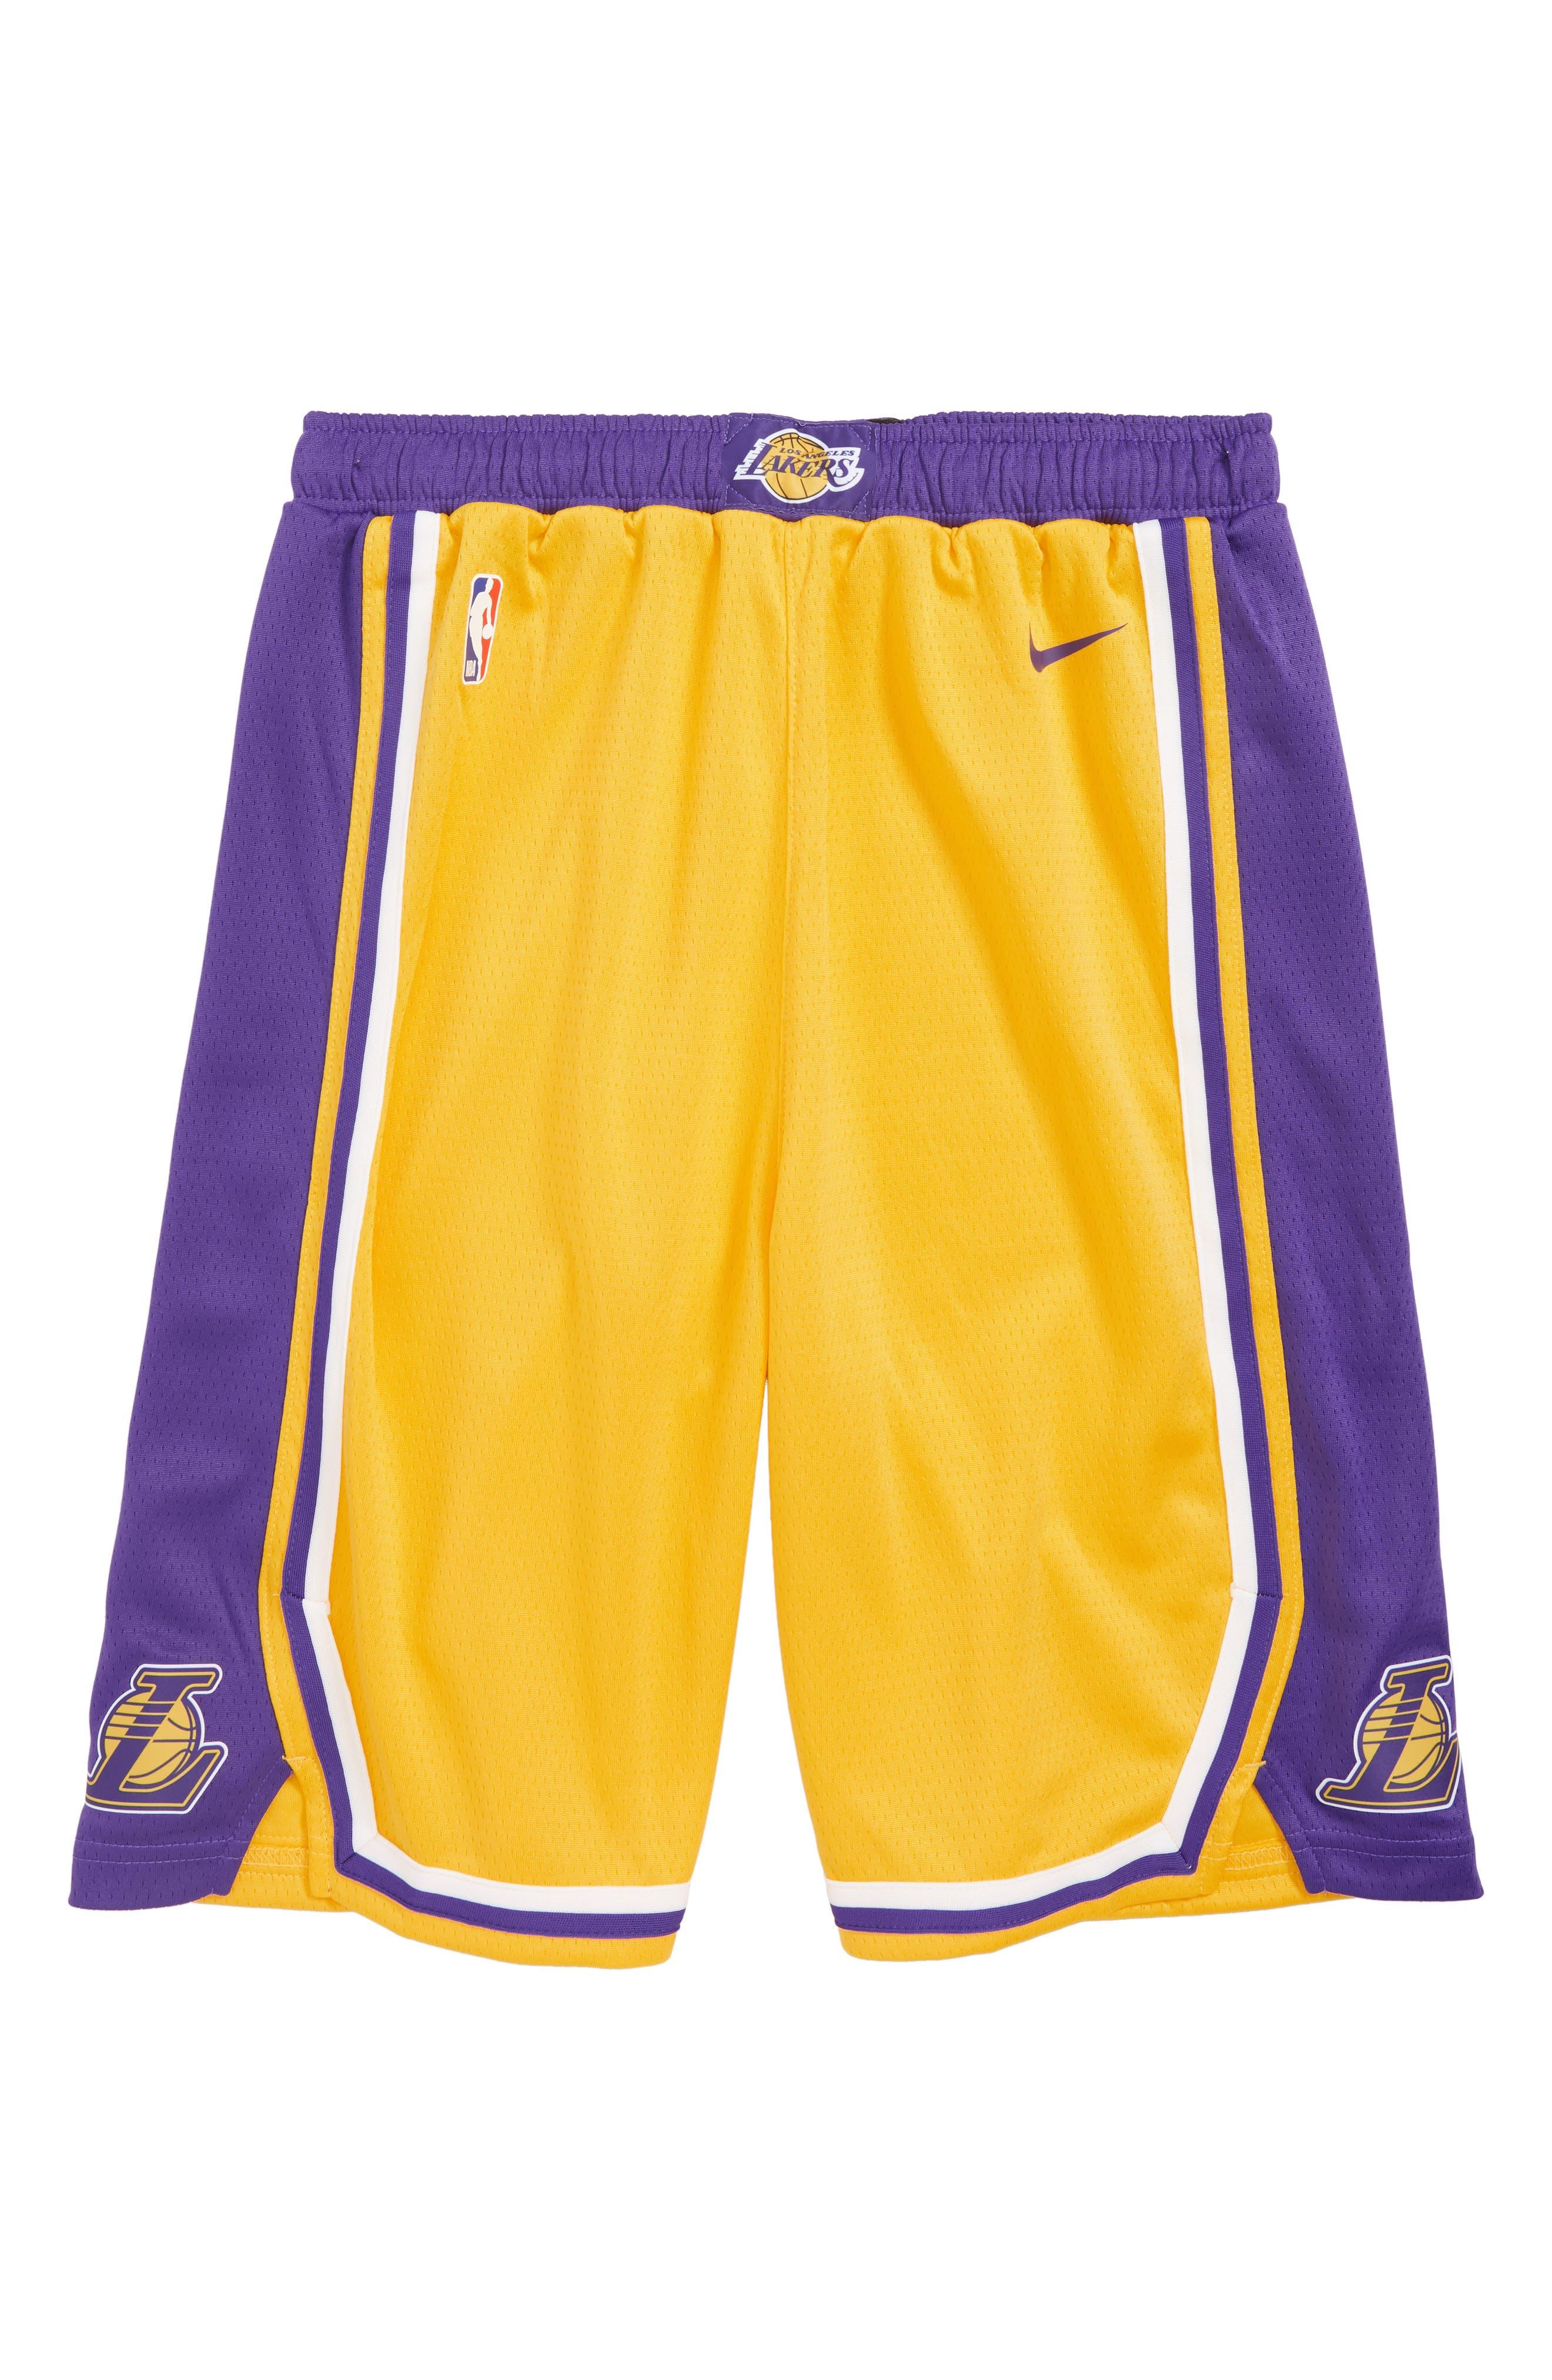 NIKE Icon Los Angeles Lakers Basketball Shorts, Main, color, 710